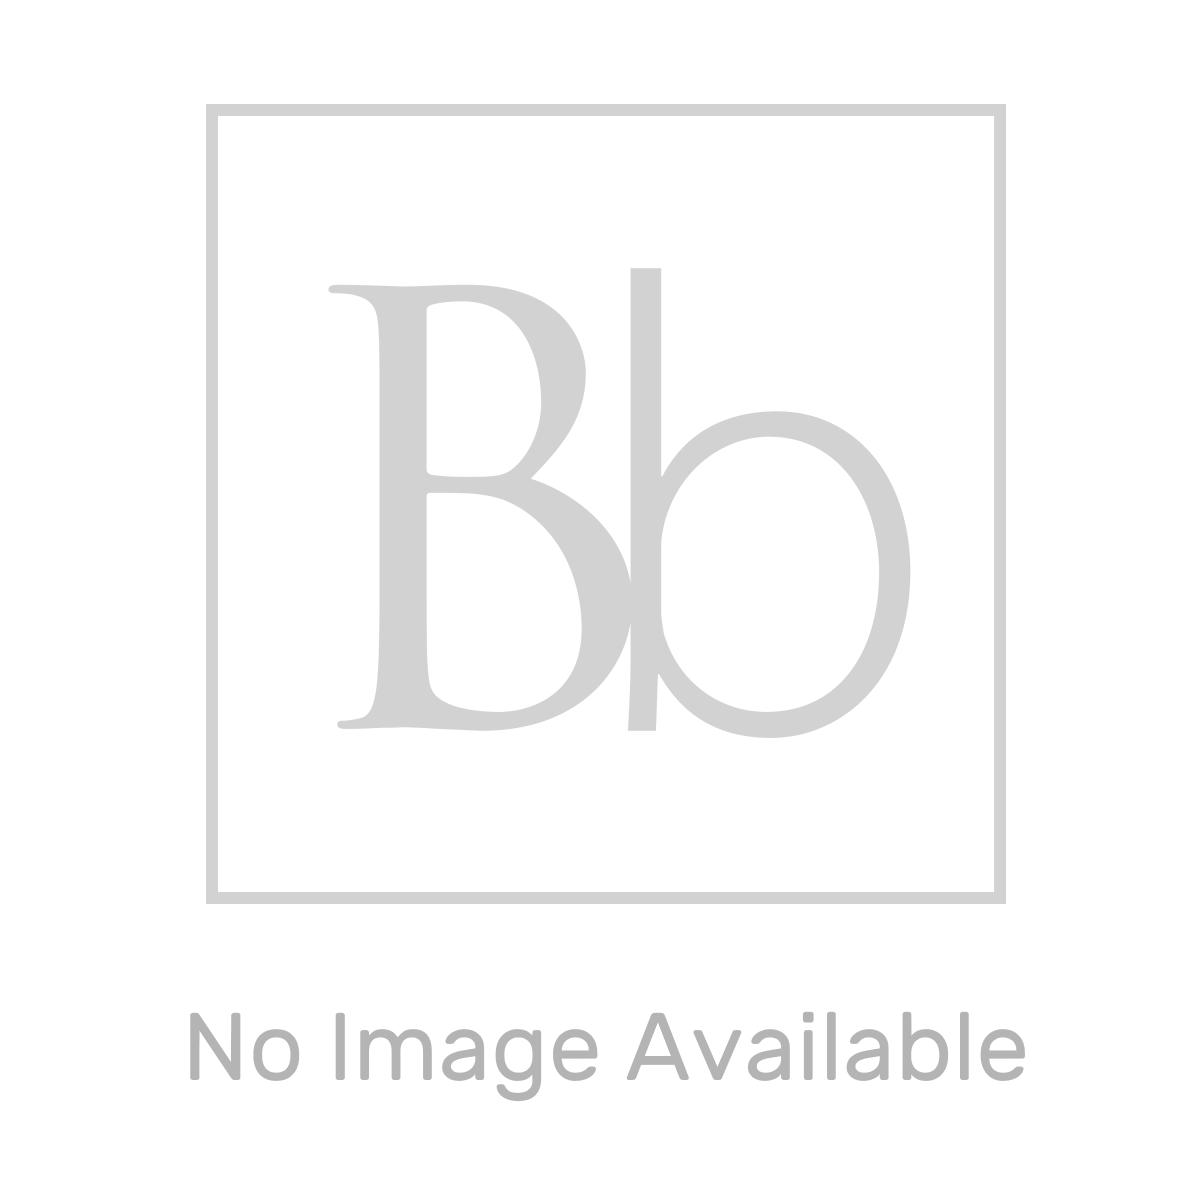 RAK Series 600 Close Coupled Toilet and 400 Series Medium Oak Mini Vanity Unit Front